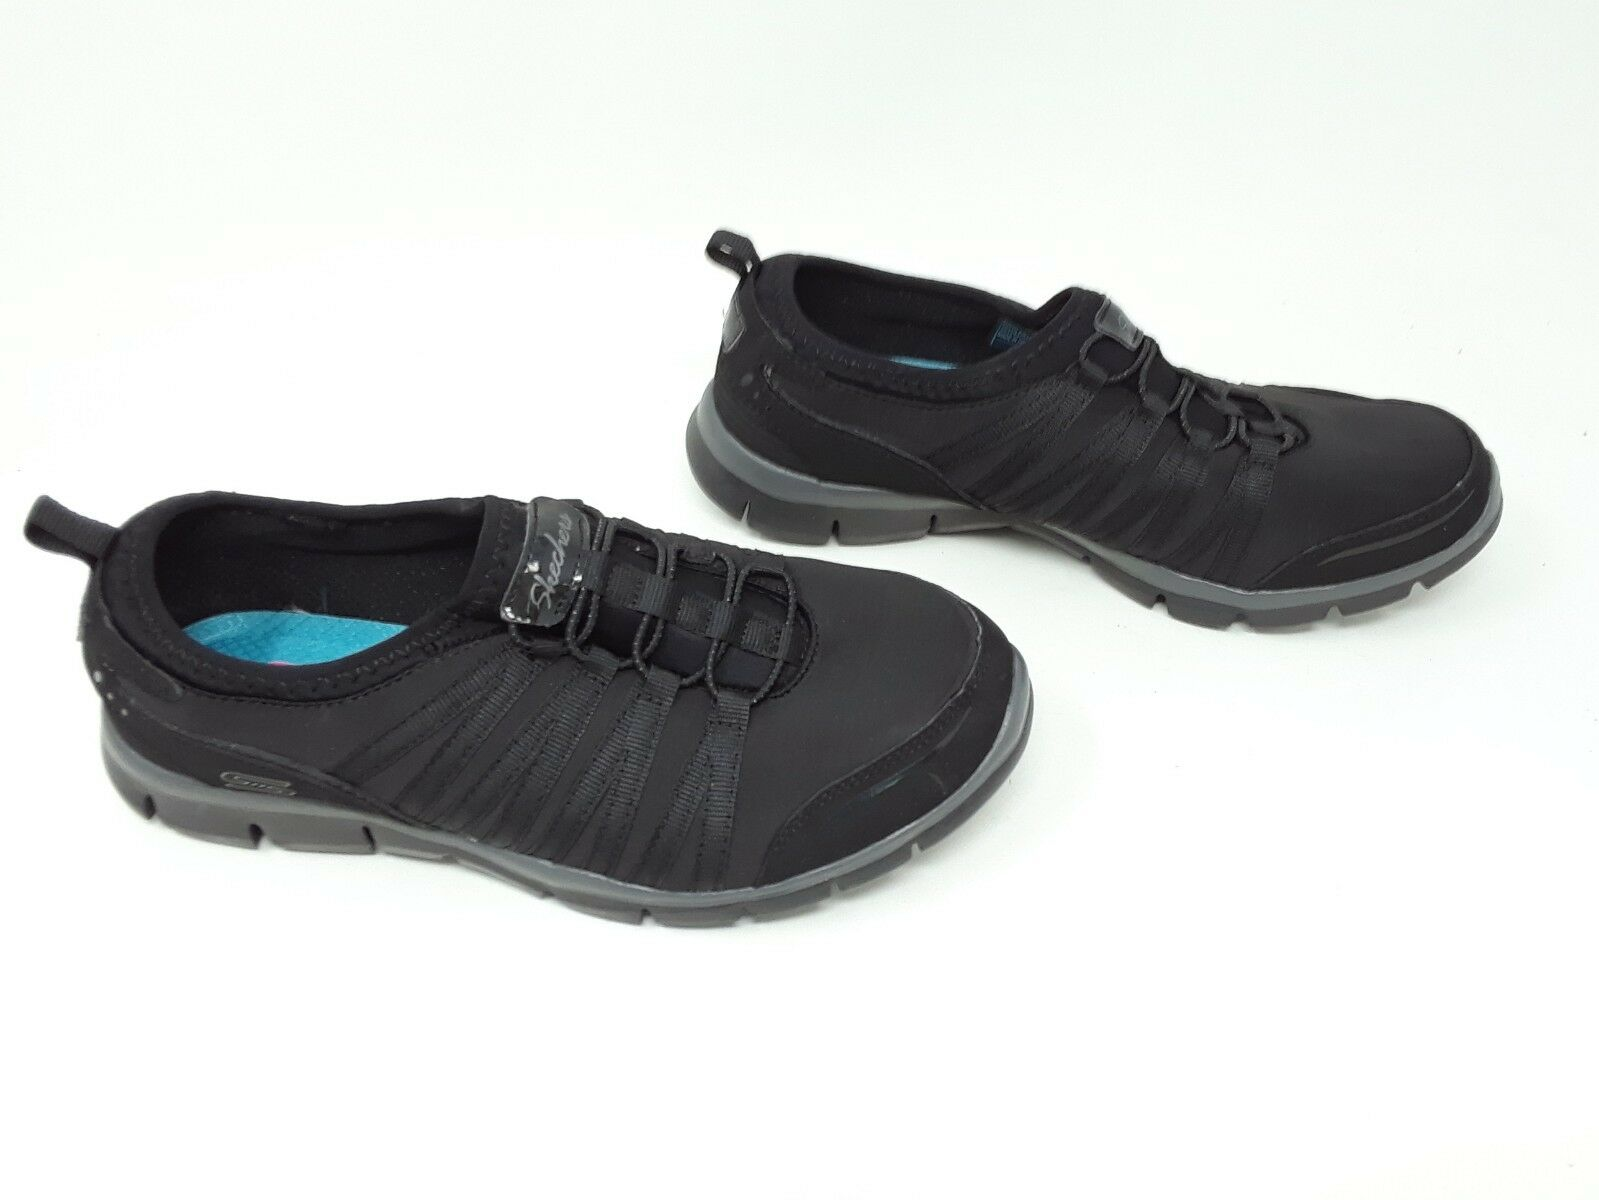 New   Women's Skechers Gratis EW wide width Sneaker 1Y